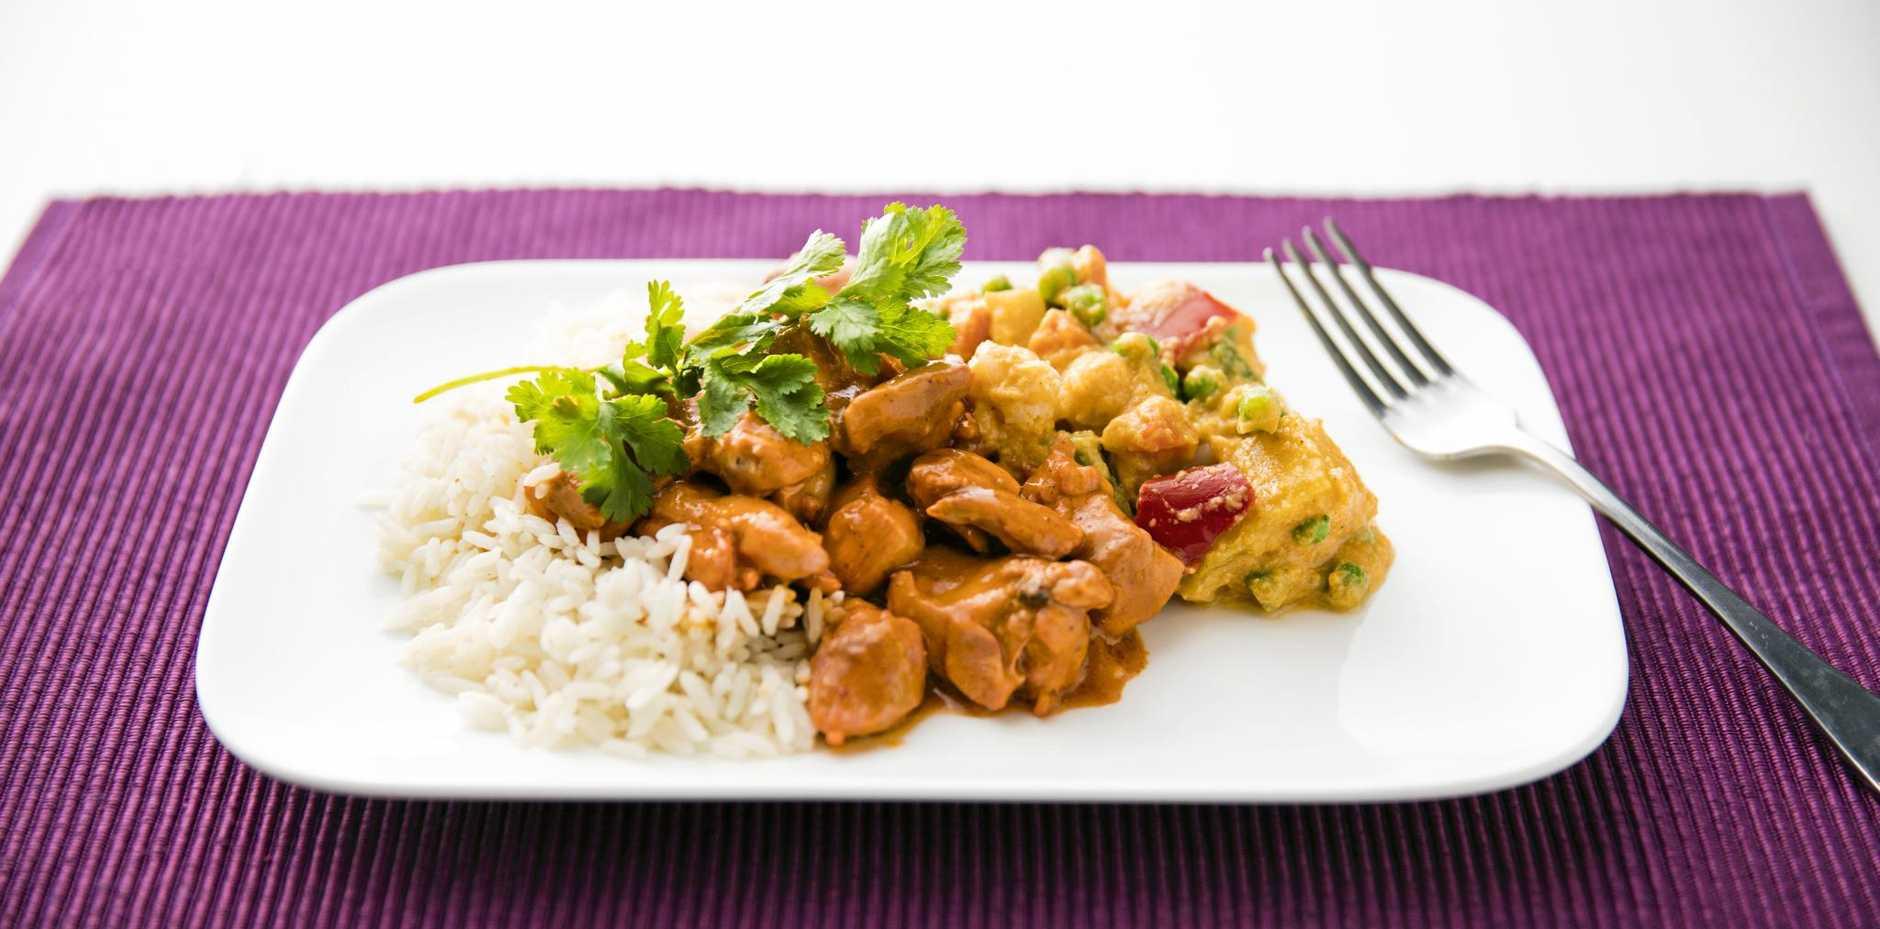 MEALS DELIVERED: Tender Loving Cuisine's inviting Butter Chicken.